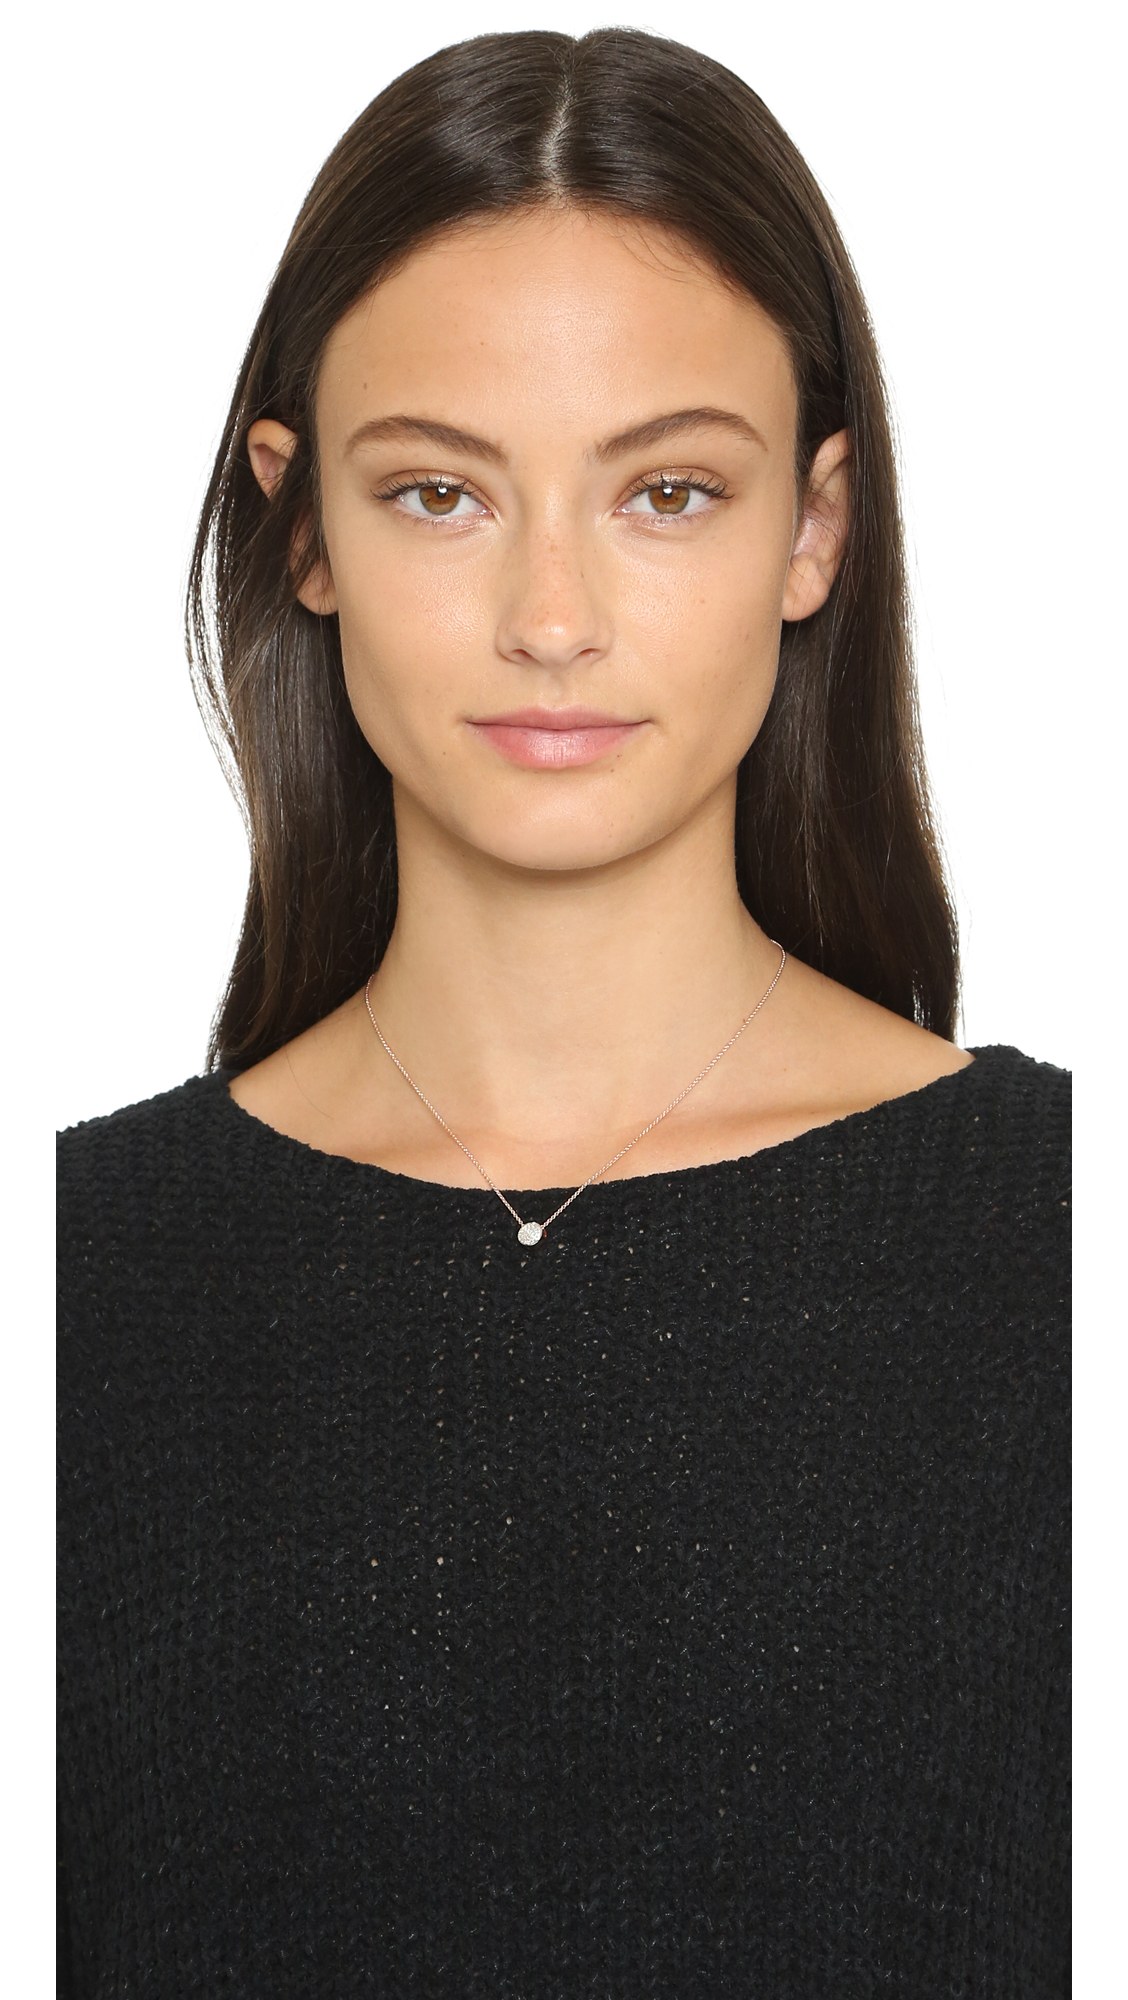 View Fullscreen - monica-vinader-diamondrose-gold-ava-button-necklace-diamondrose-gold-pink-product-1-162426256-normal